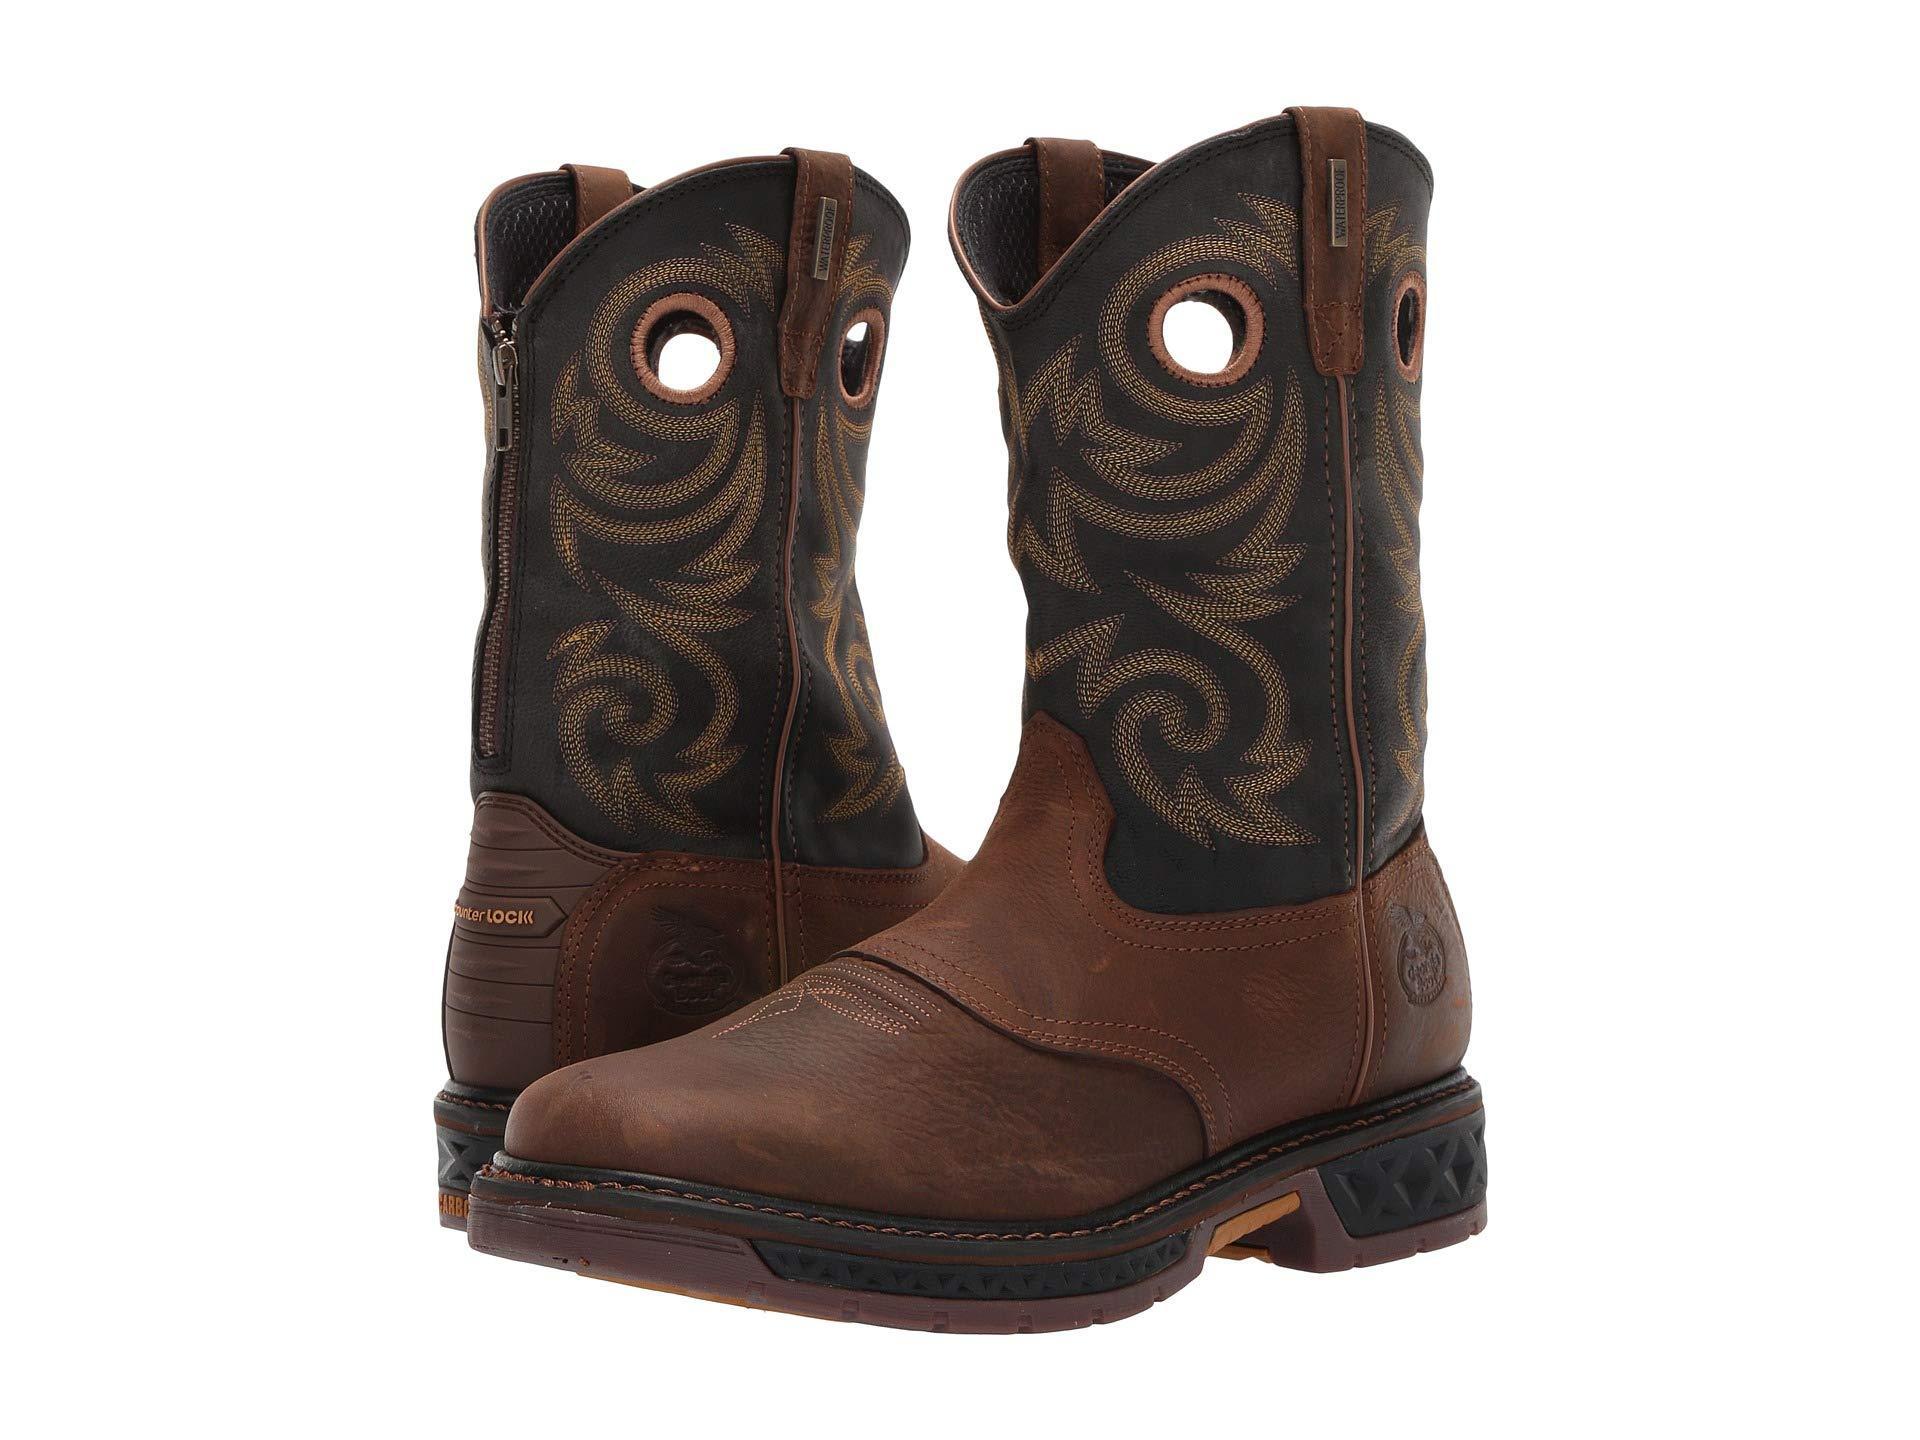 176dbeae0a7 Men's Brown Carbo-tec 11 Soft Toe Waterproof Back Zip